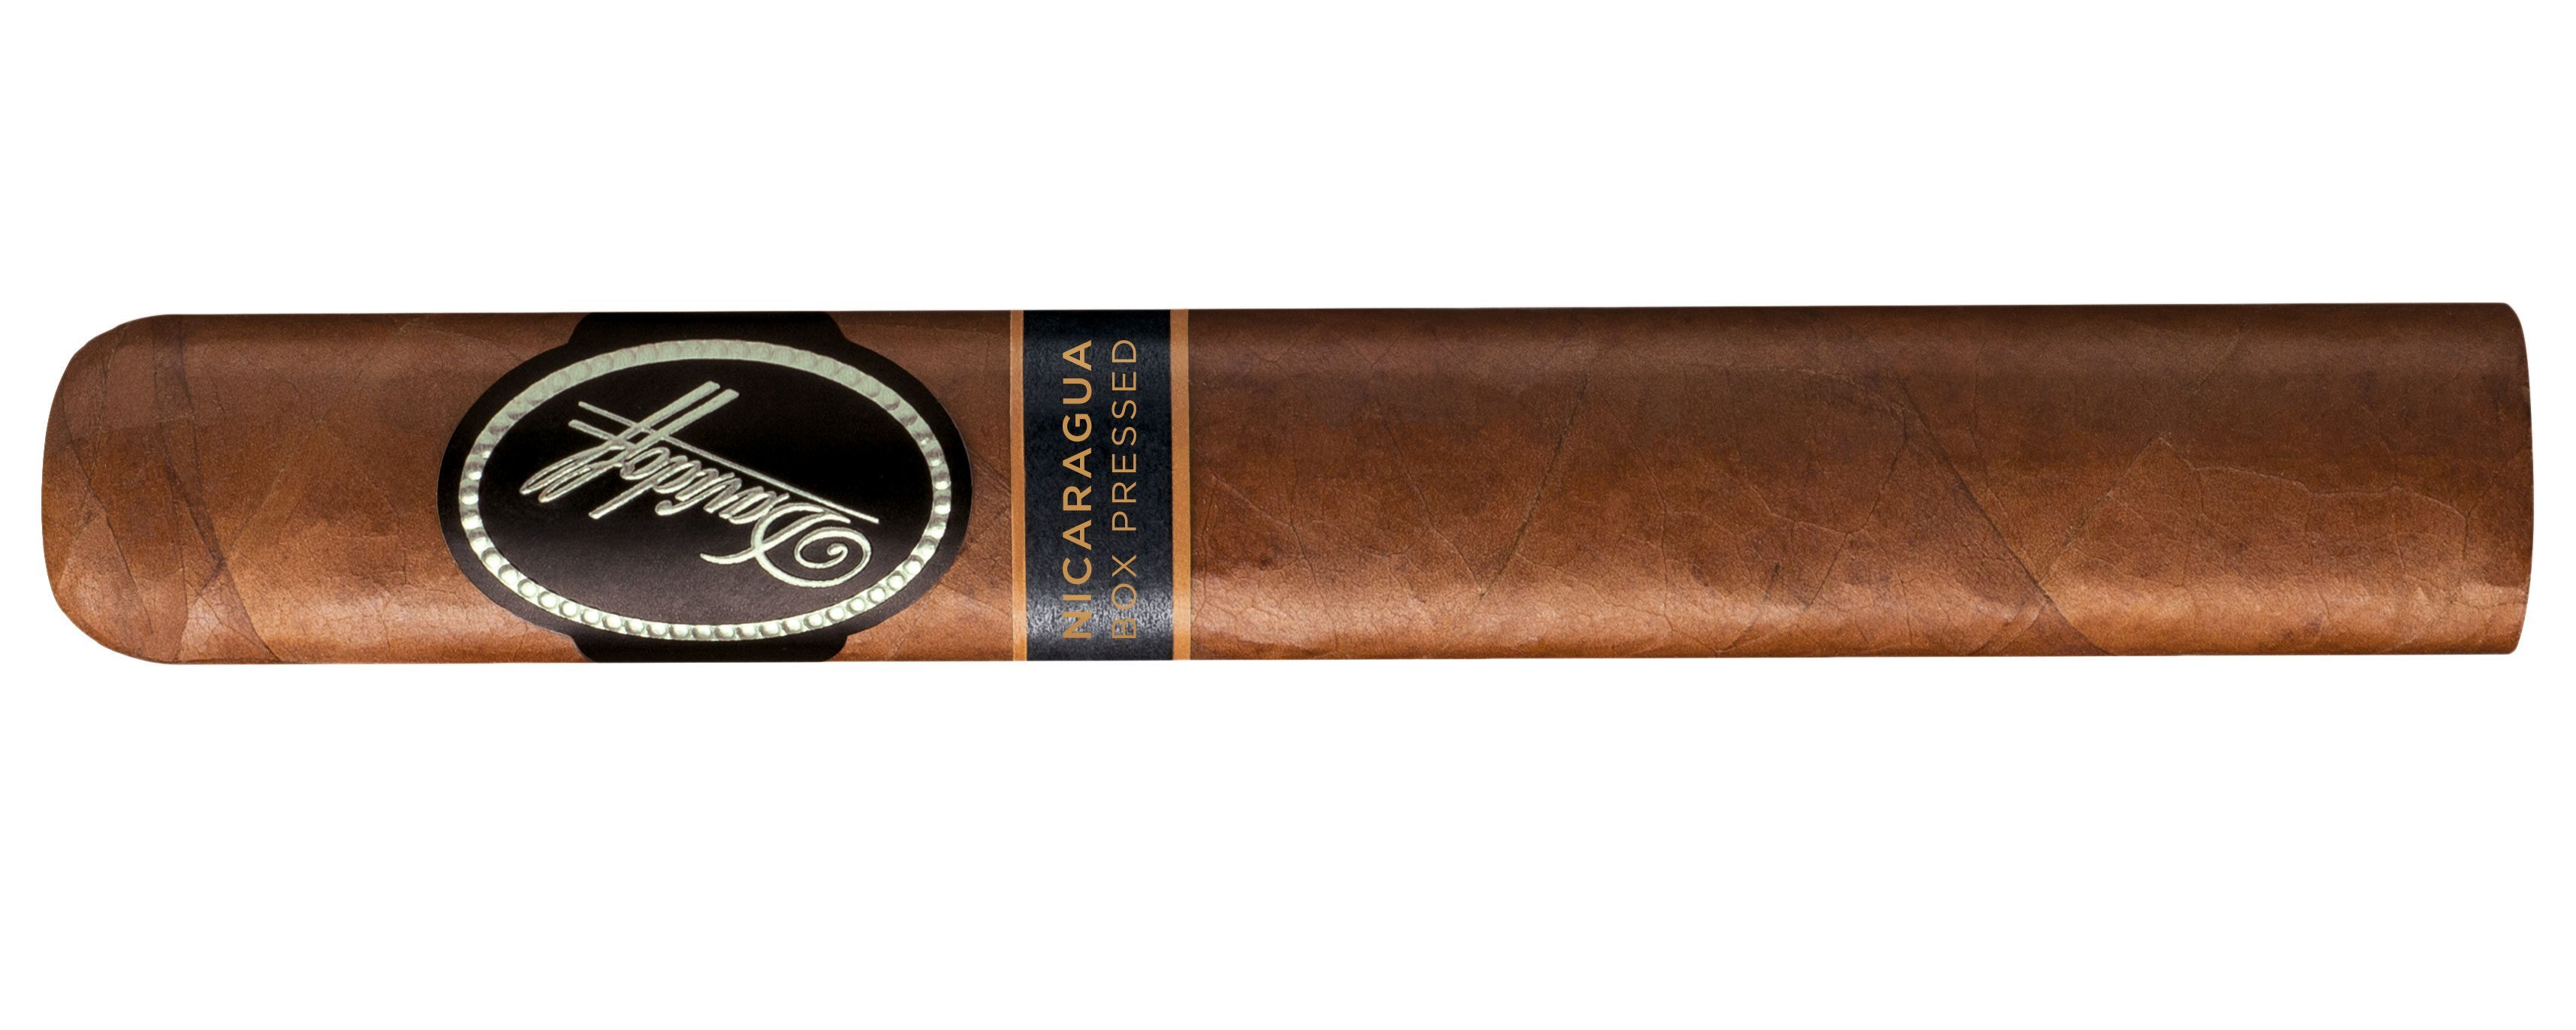 Blind Cigar Review: Davidoff | Nicaragua Box Pressed